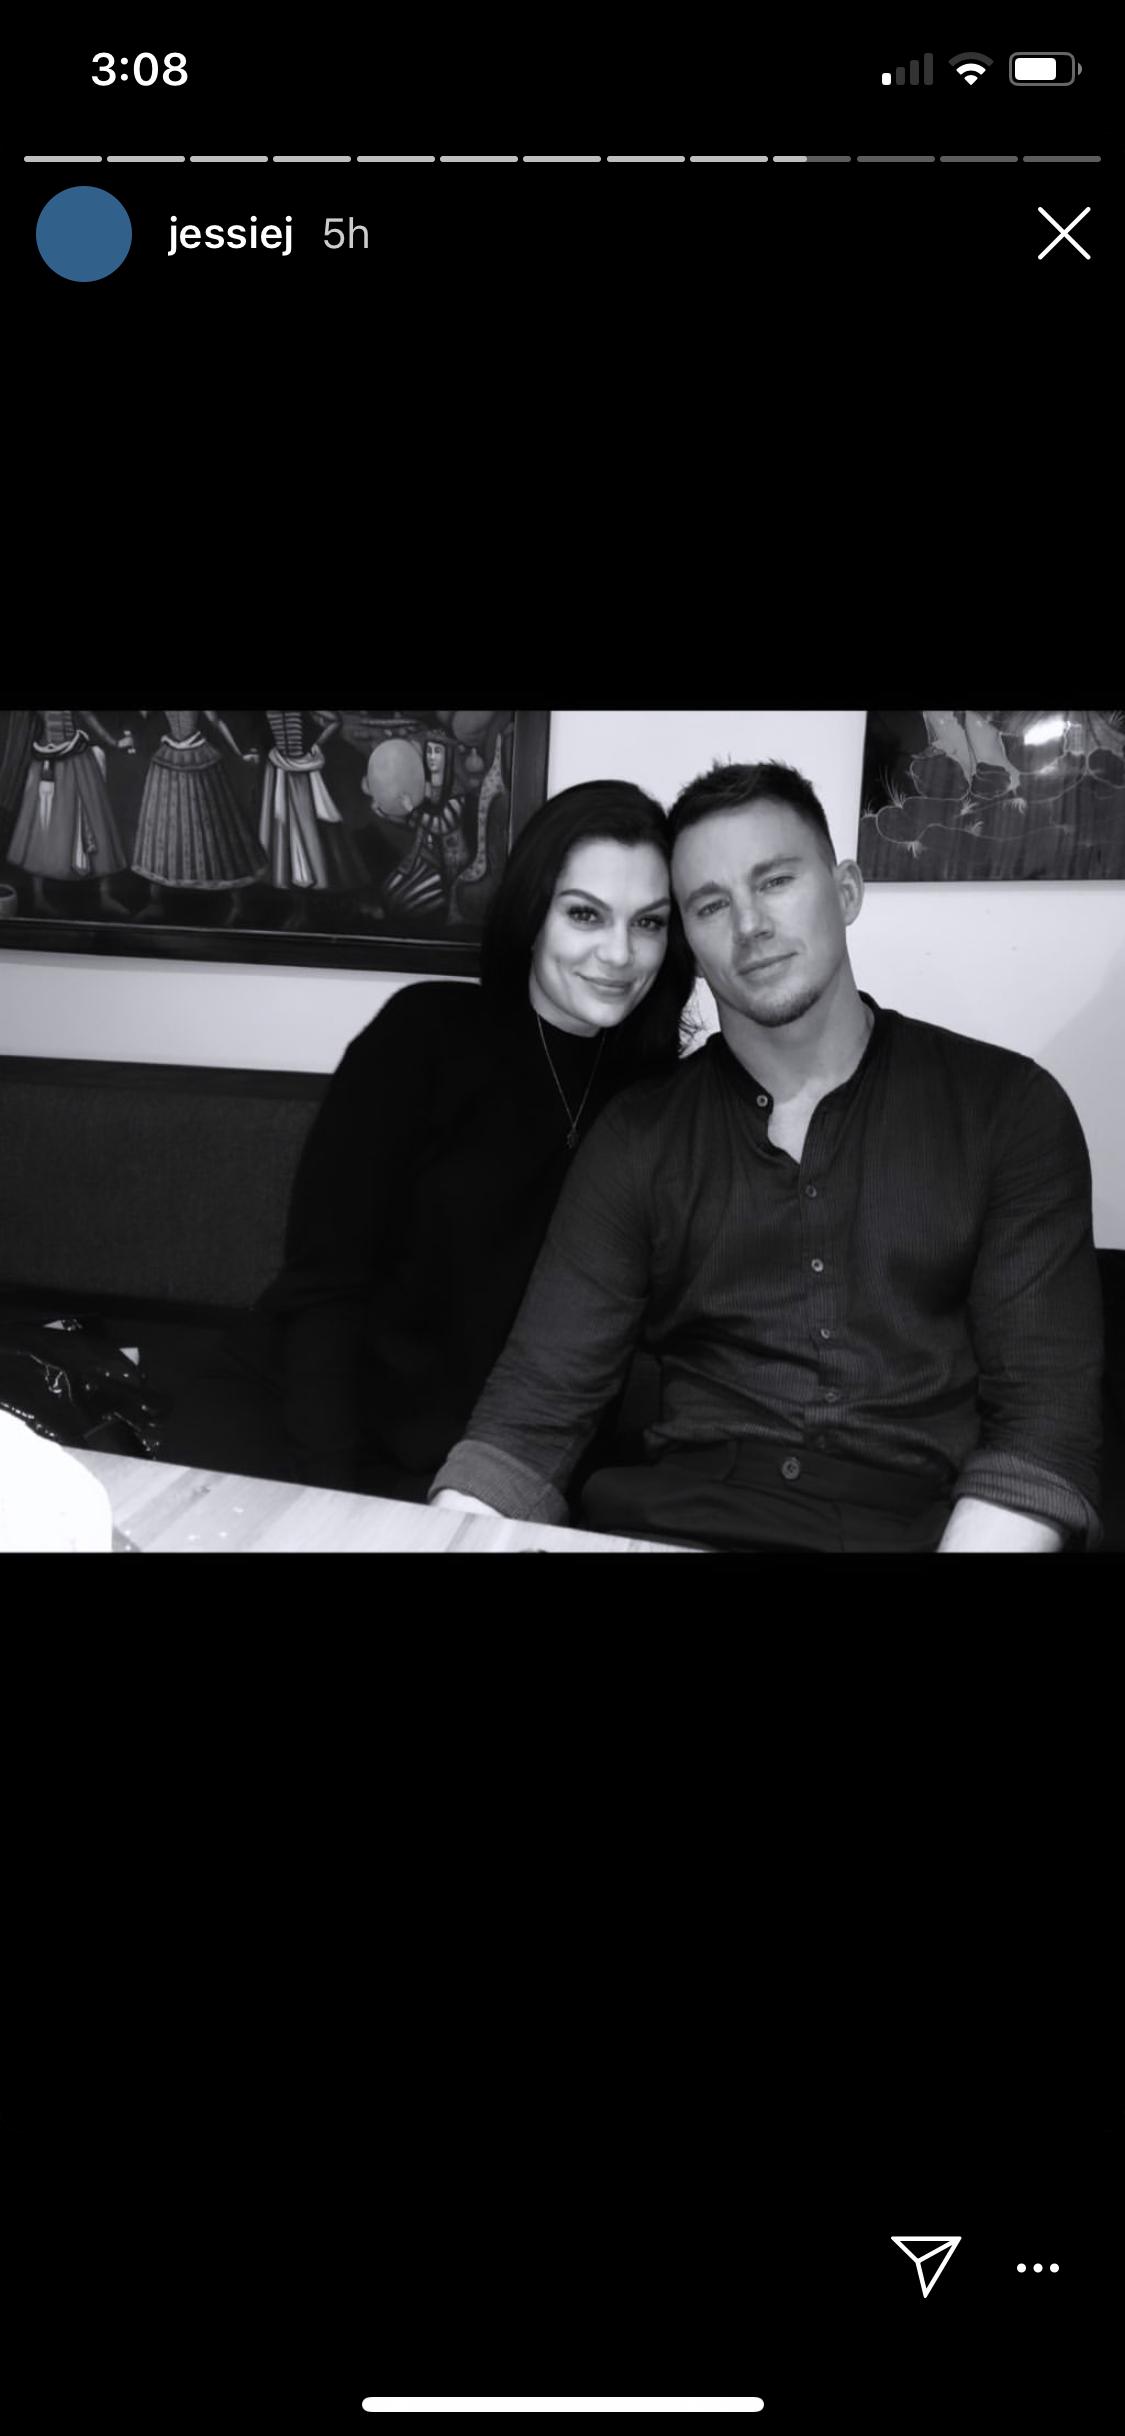 dating in Prescott AZ Wie is Emily Maynard dating na de vrijgezellen